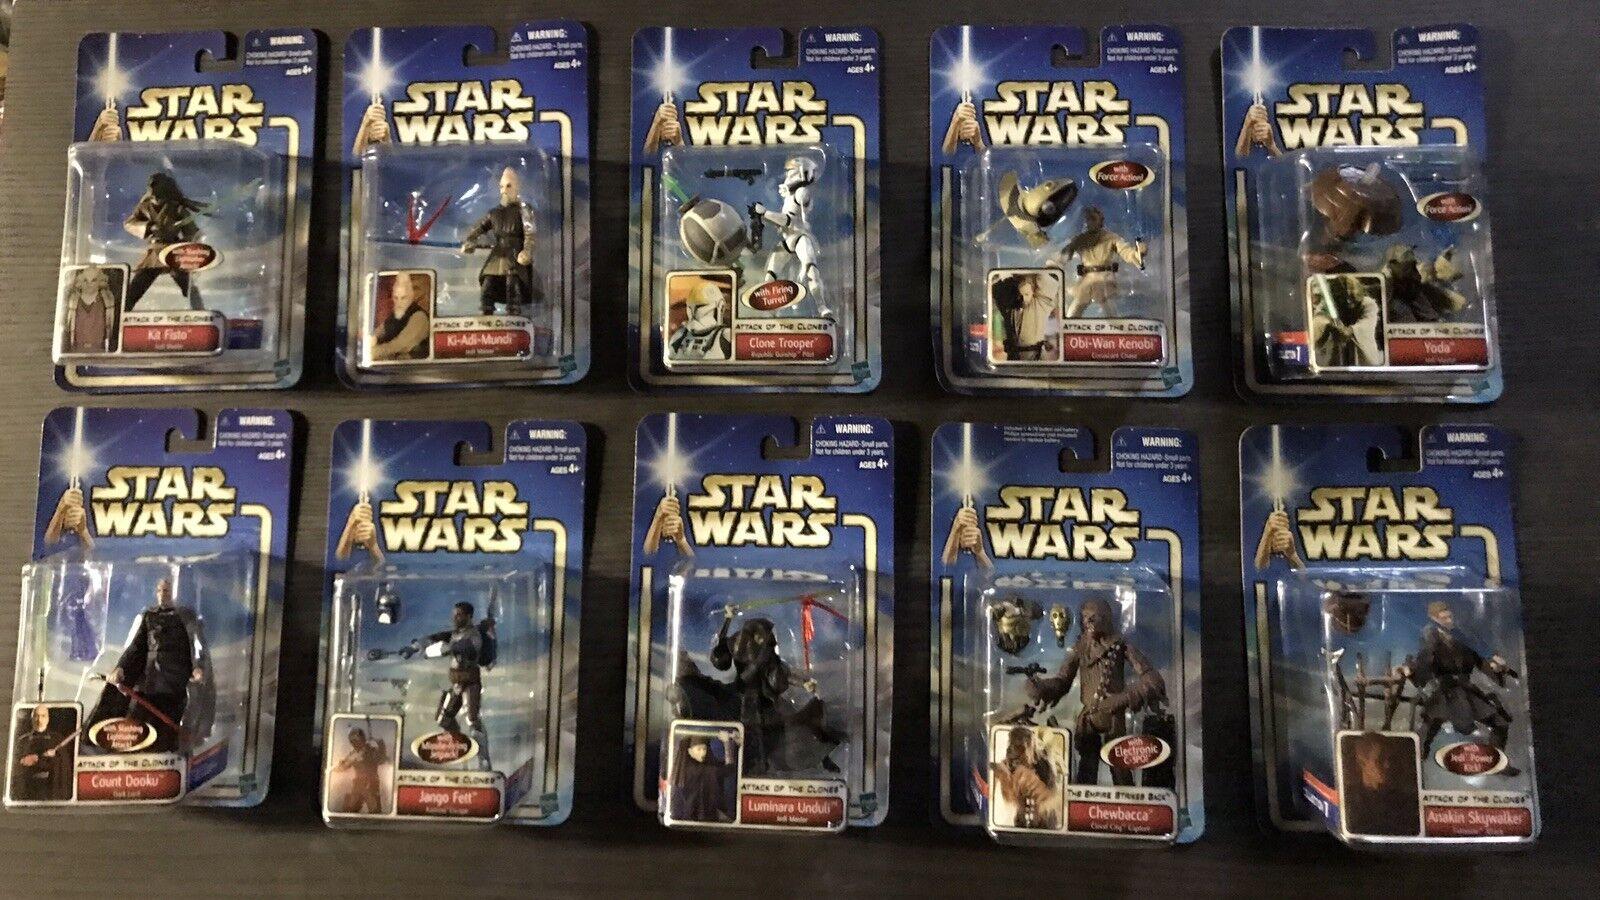 Star Wars Episode 2 Case of 10 - 12  Figures Case Excellent Condition